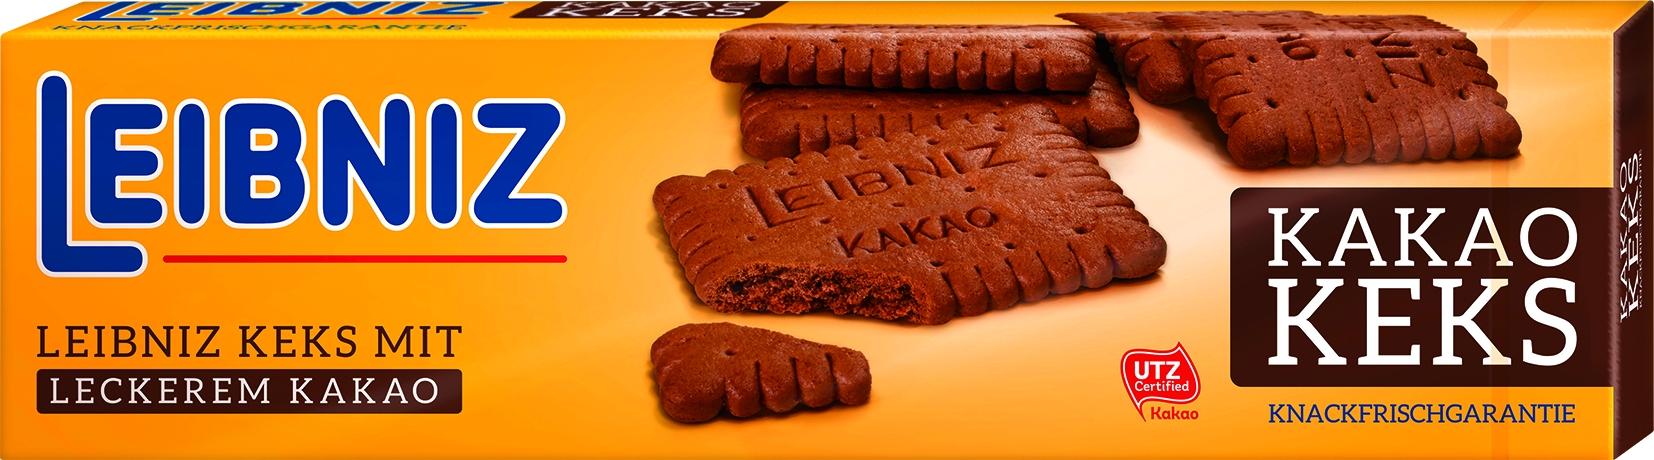 Leibniz Kakaokeks